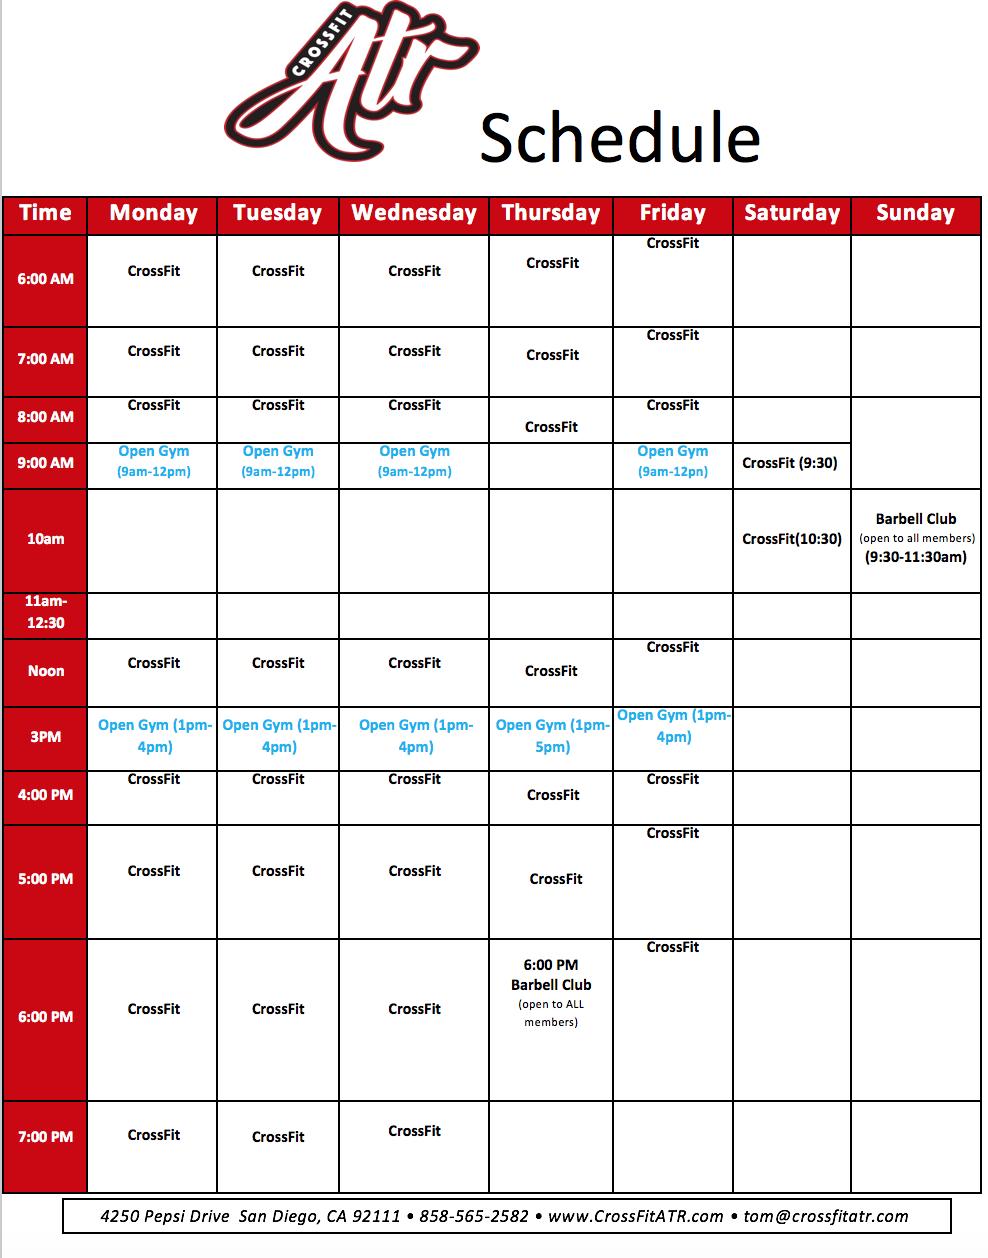 Crossfit ATR Schedule